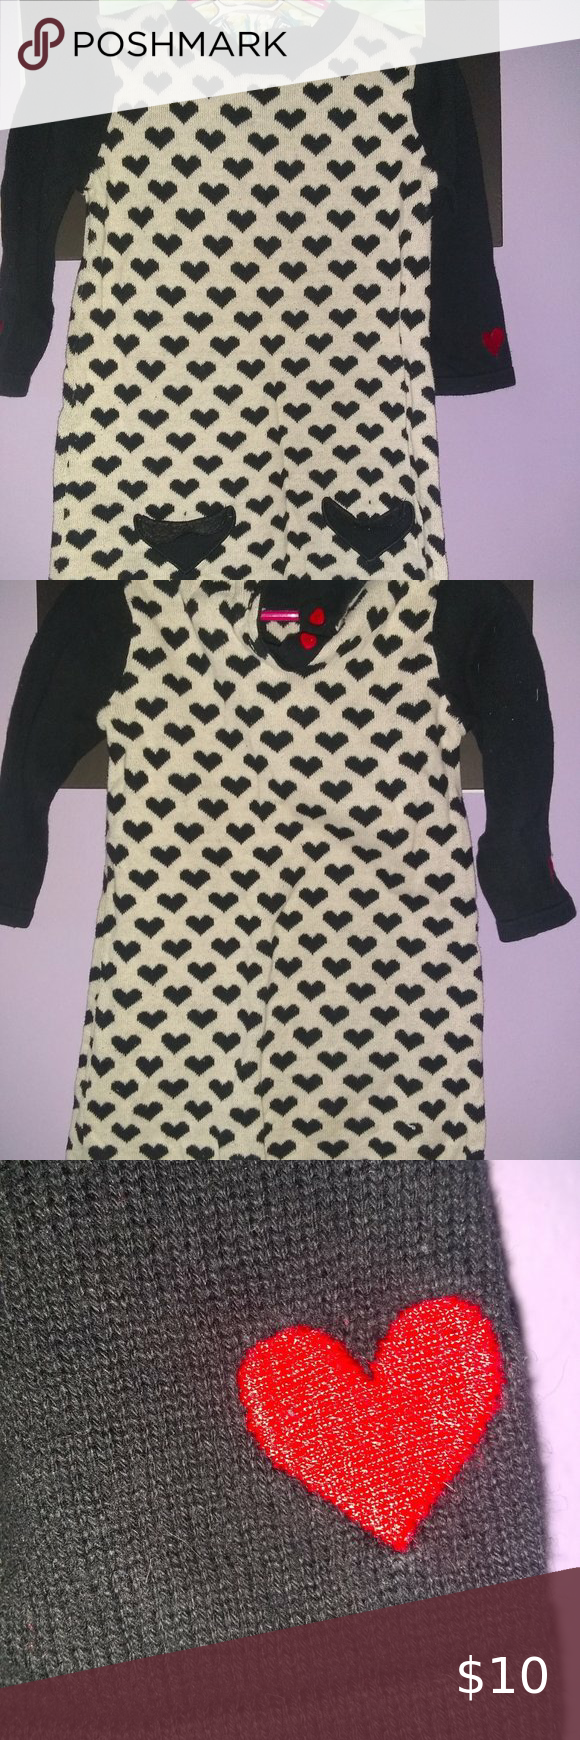 Savannah Sweater Dress Size 4t White Sweater Dress Sweater Dress Sweaters [ 1740 x 580 Pixel ]